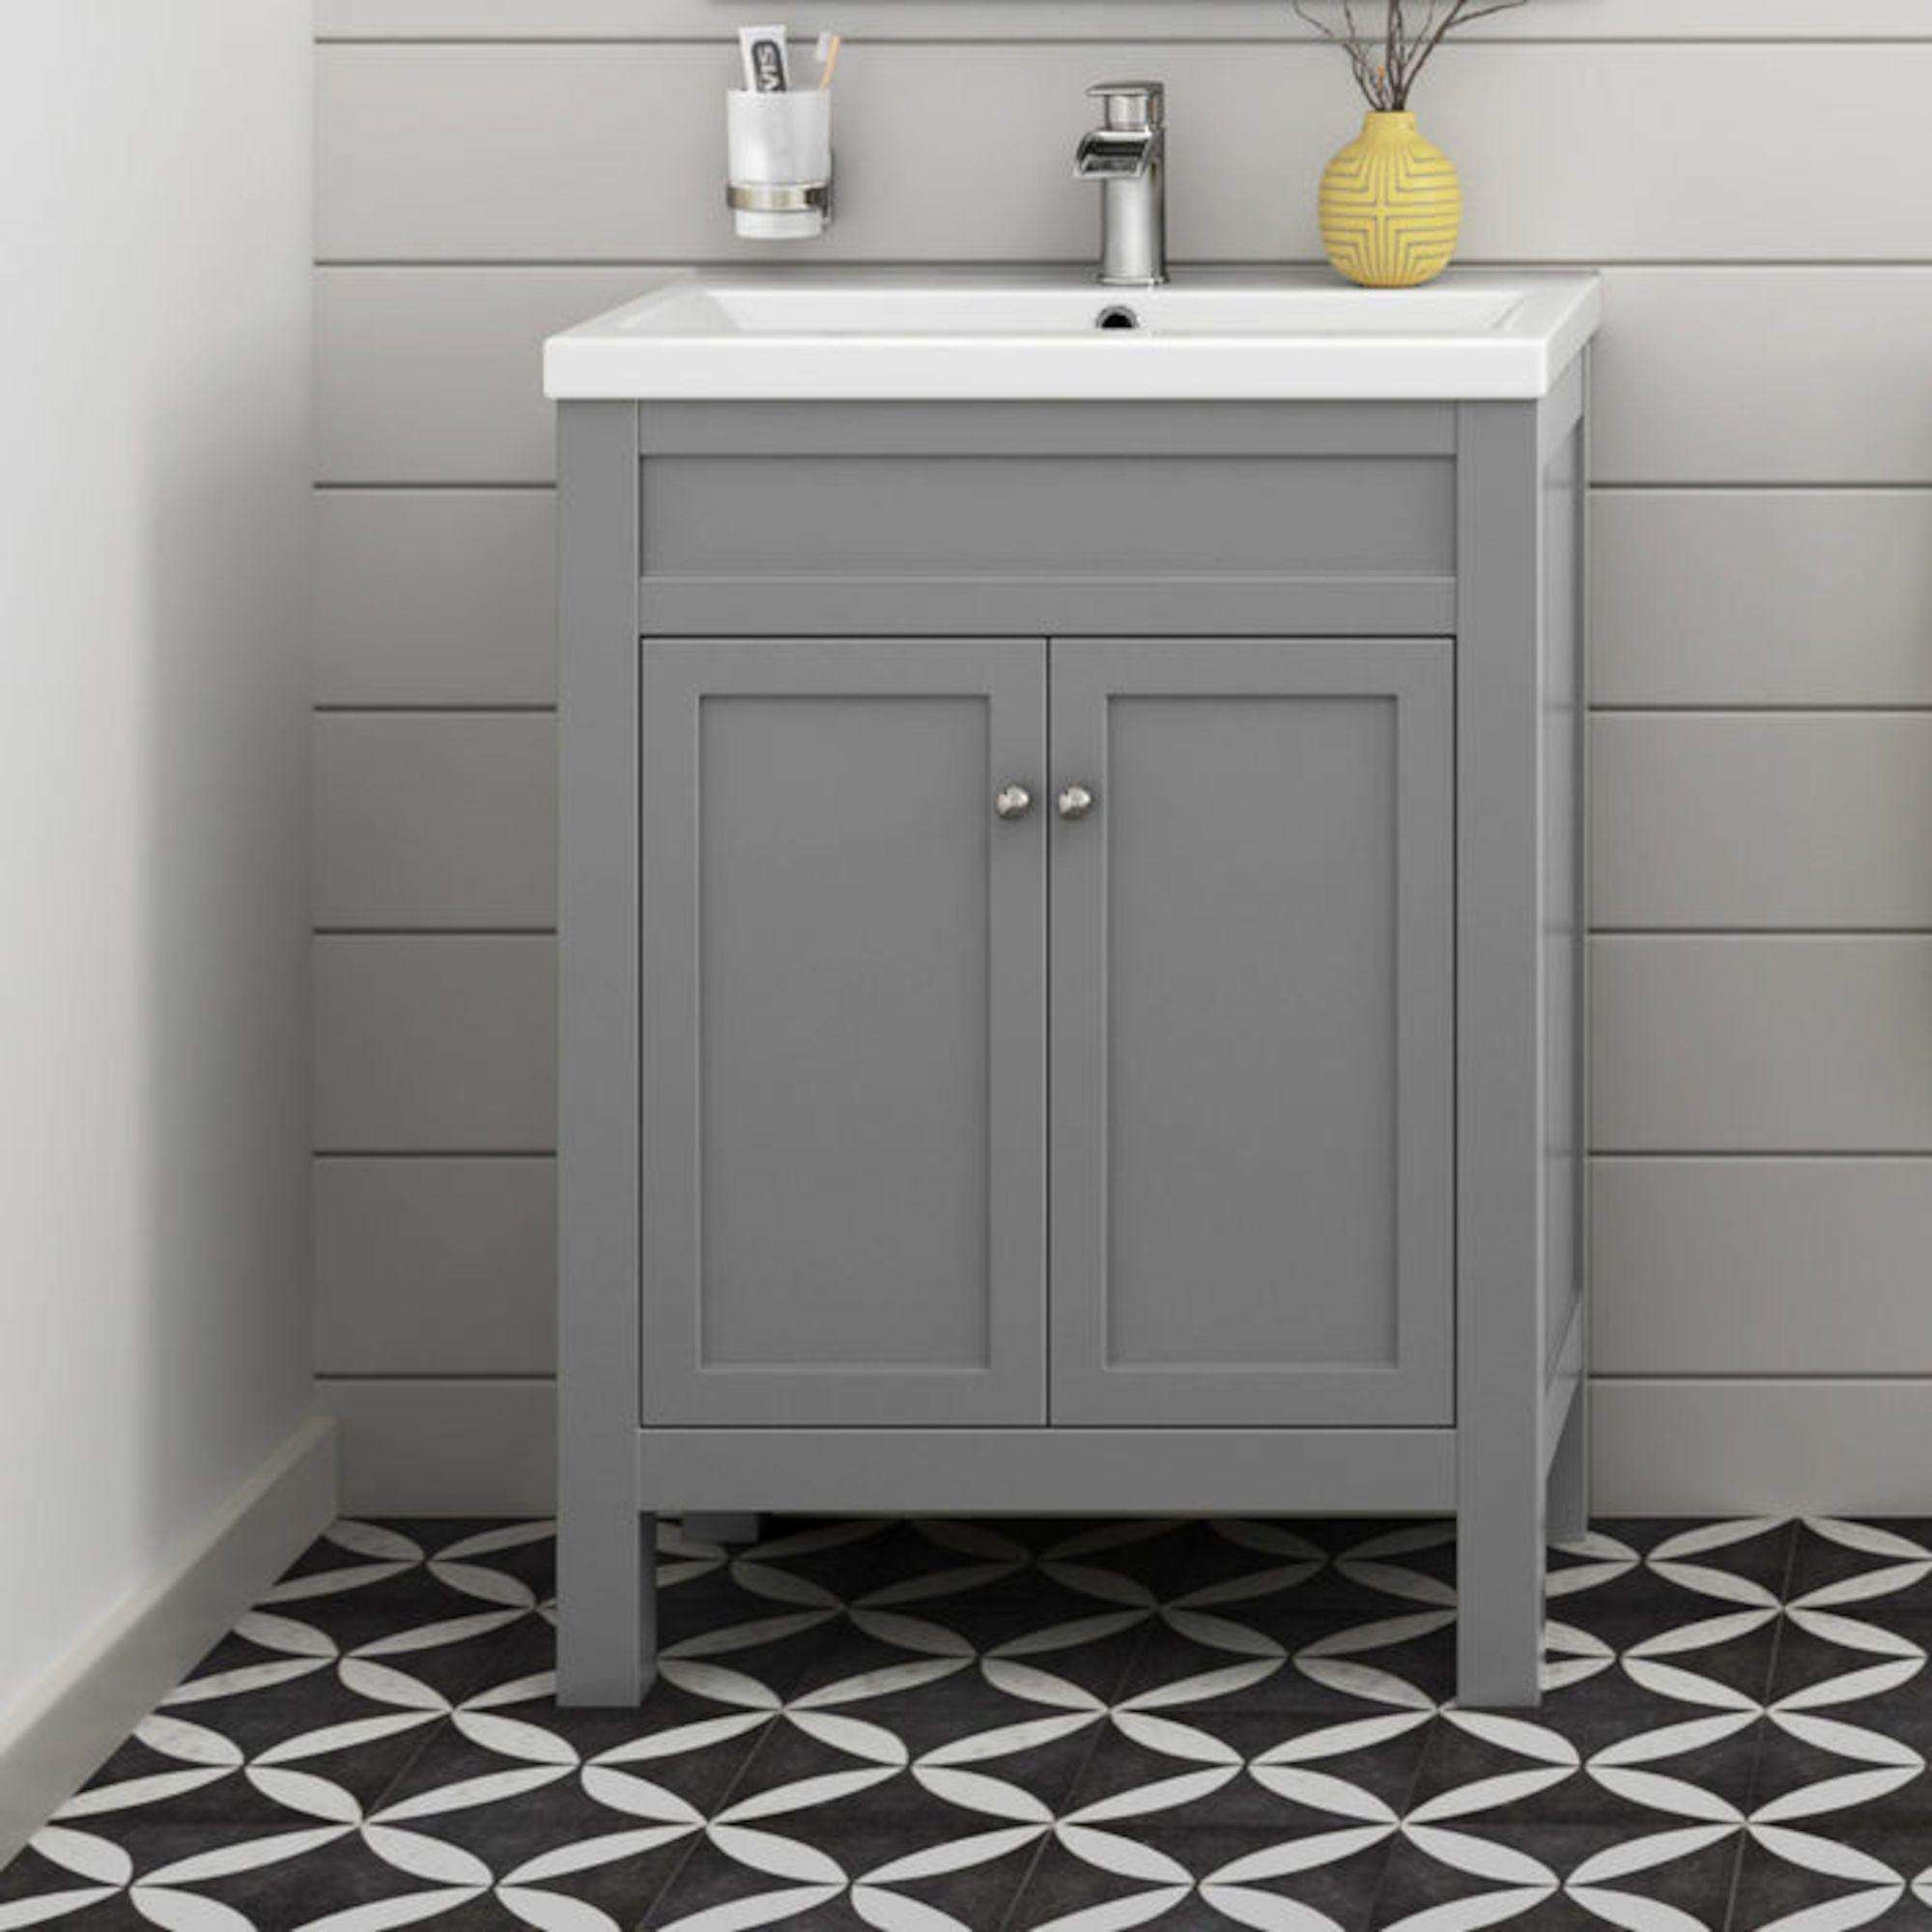 600mm Melbourne Earl Grey Vanity Unit Denver Tap Floor Standing Bathroom Sink Units Grey Vanity Unit Bathroom Units